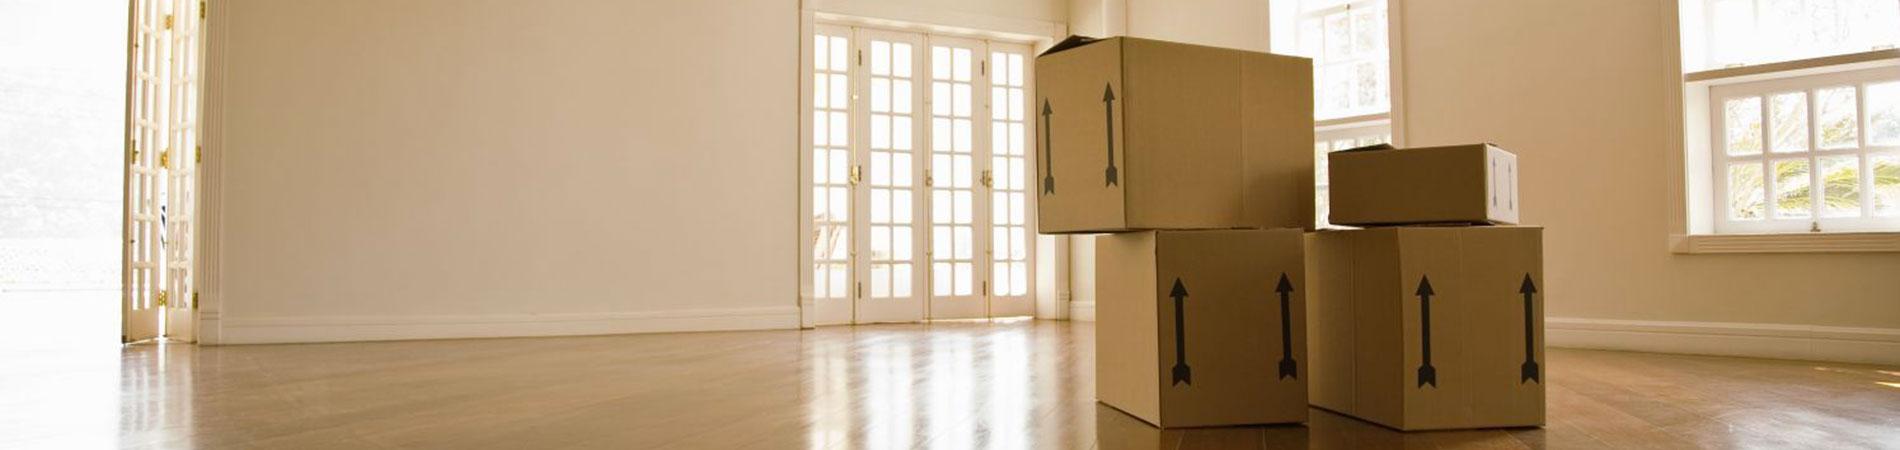 ritiro mobili usati gratis roma e latina